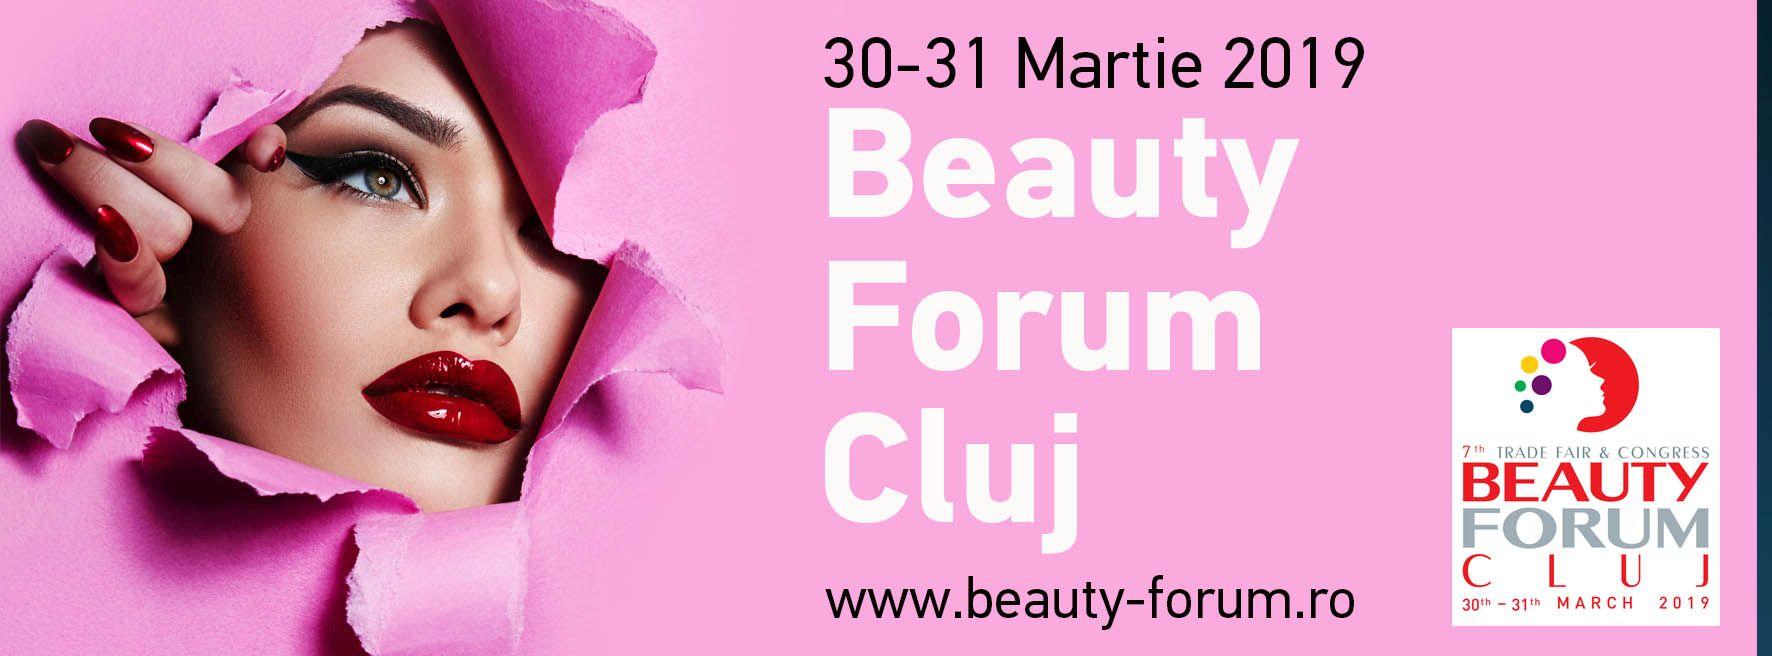 Beauty forum Cluj Napoca 20192